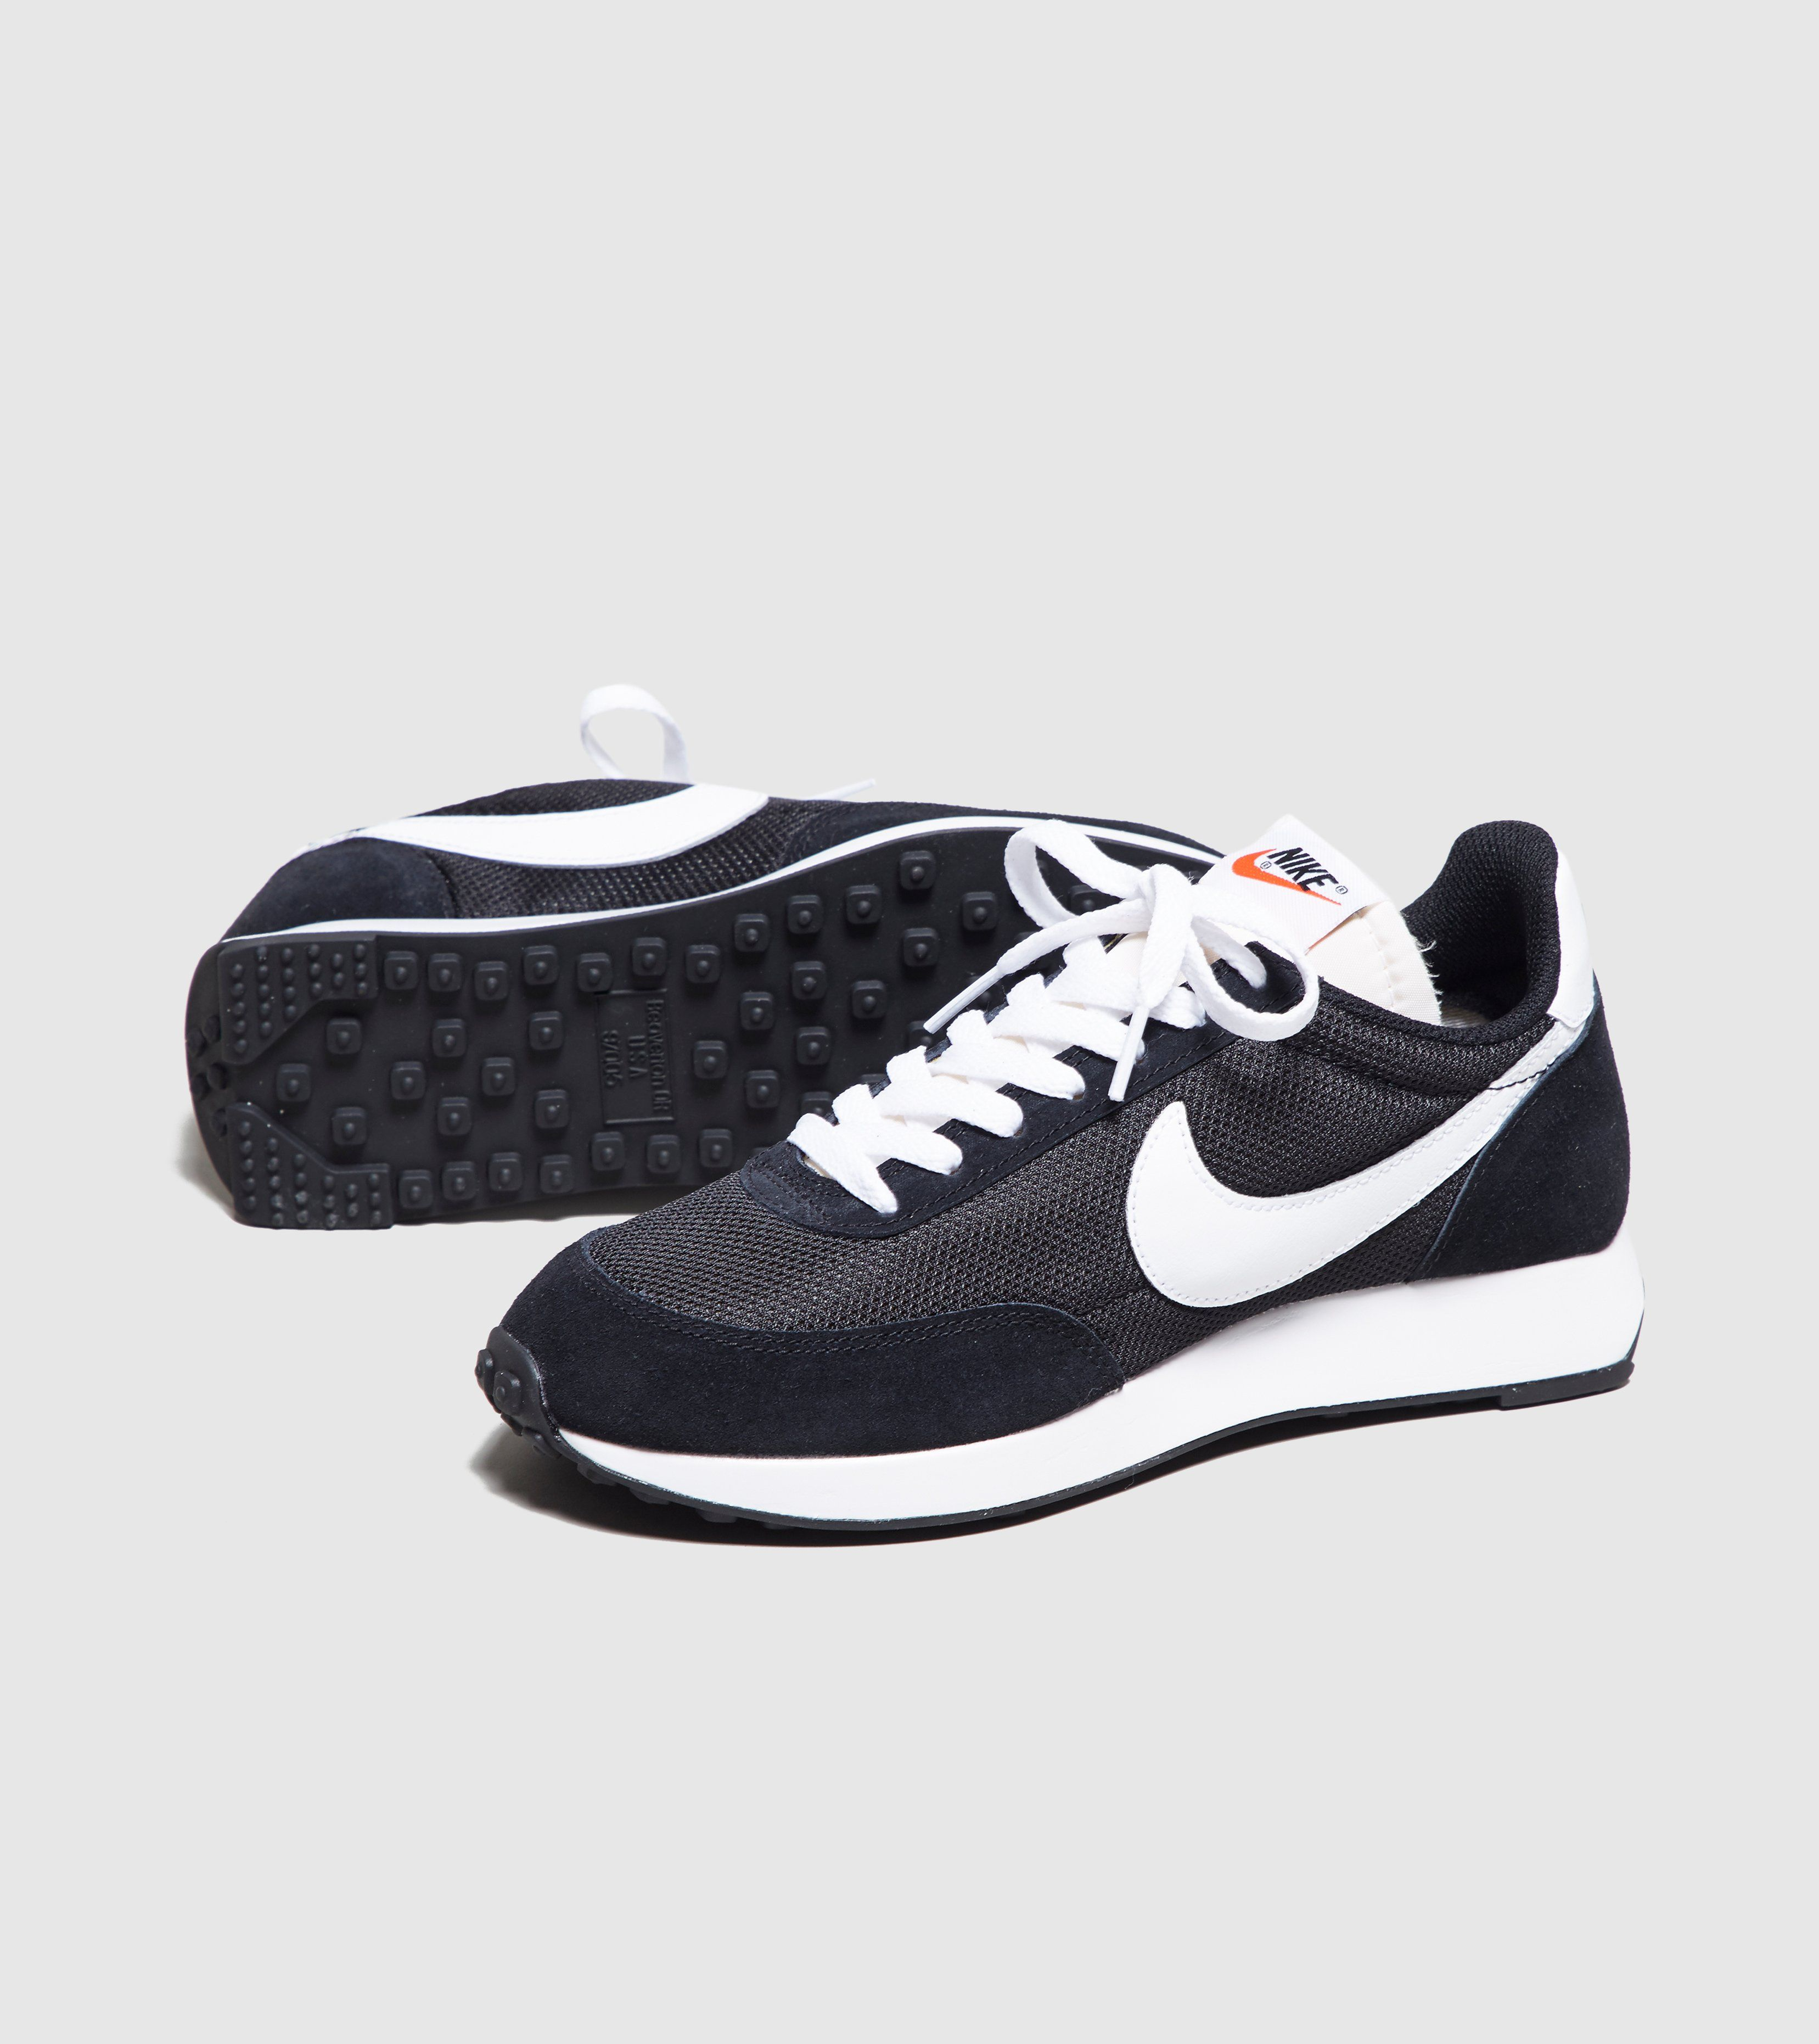 Nike Tailwind 79 OG Femme